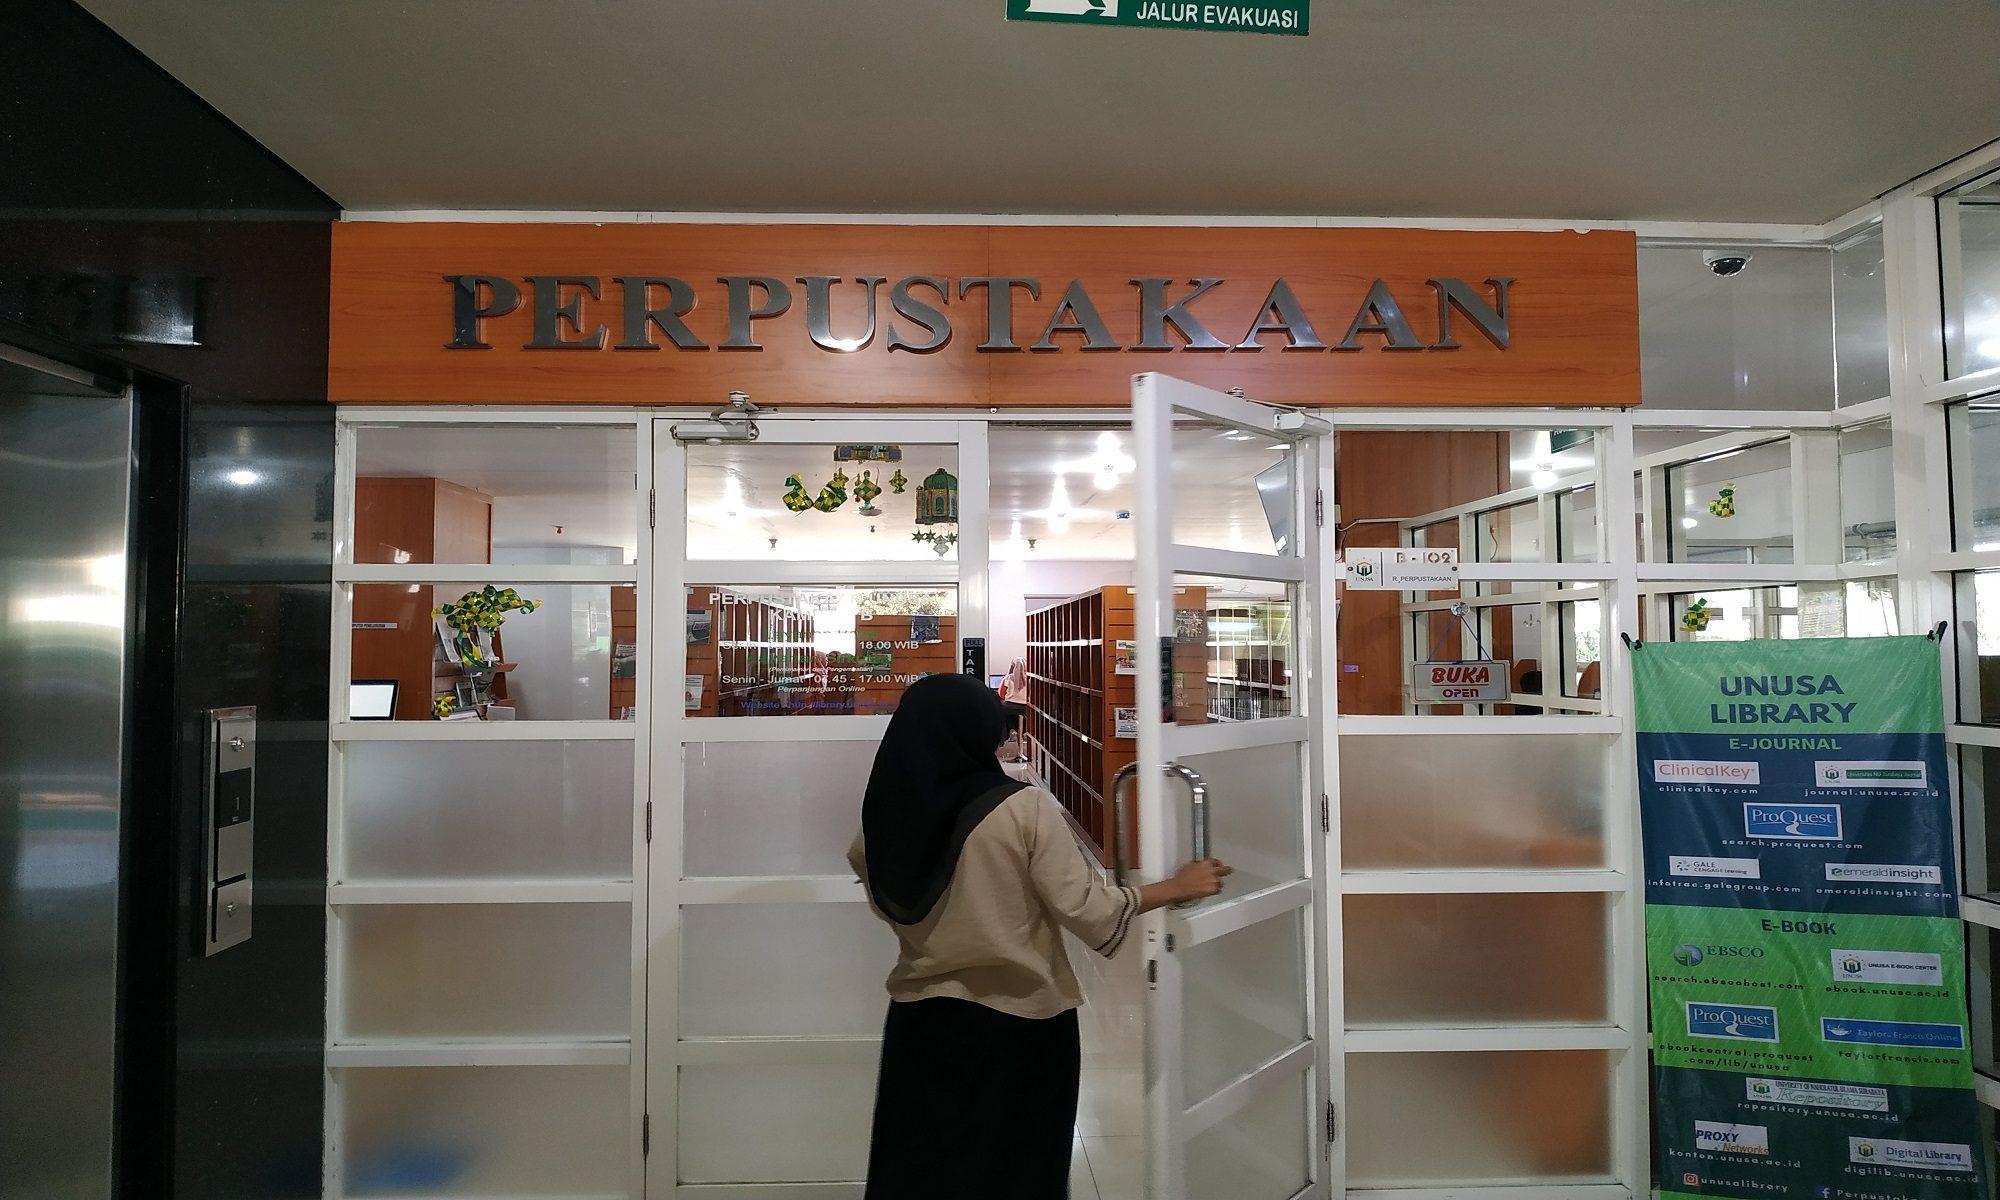 Perpustakaan Universitas Nahdlatul Ulama Surabaya